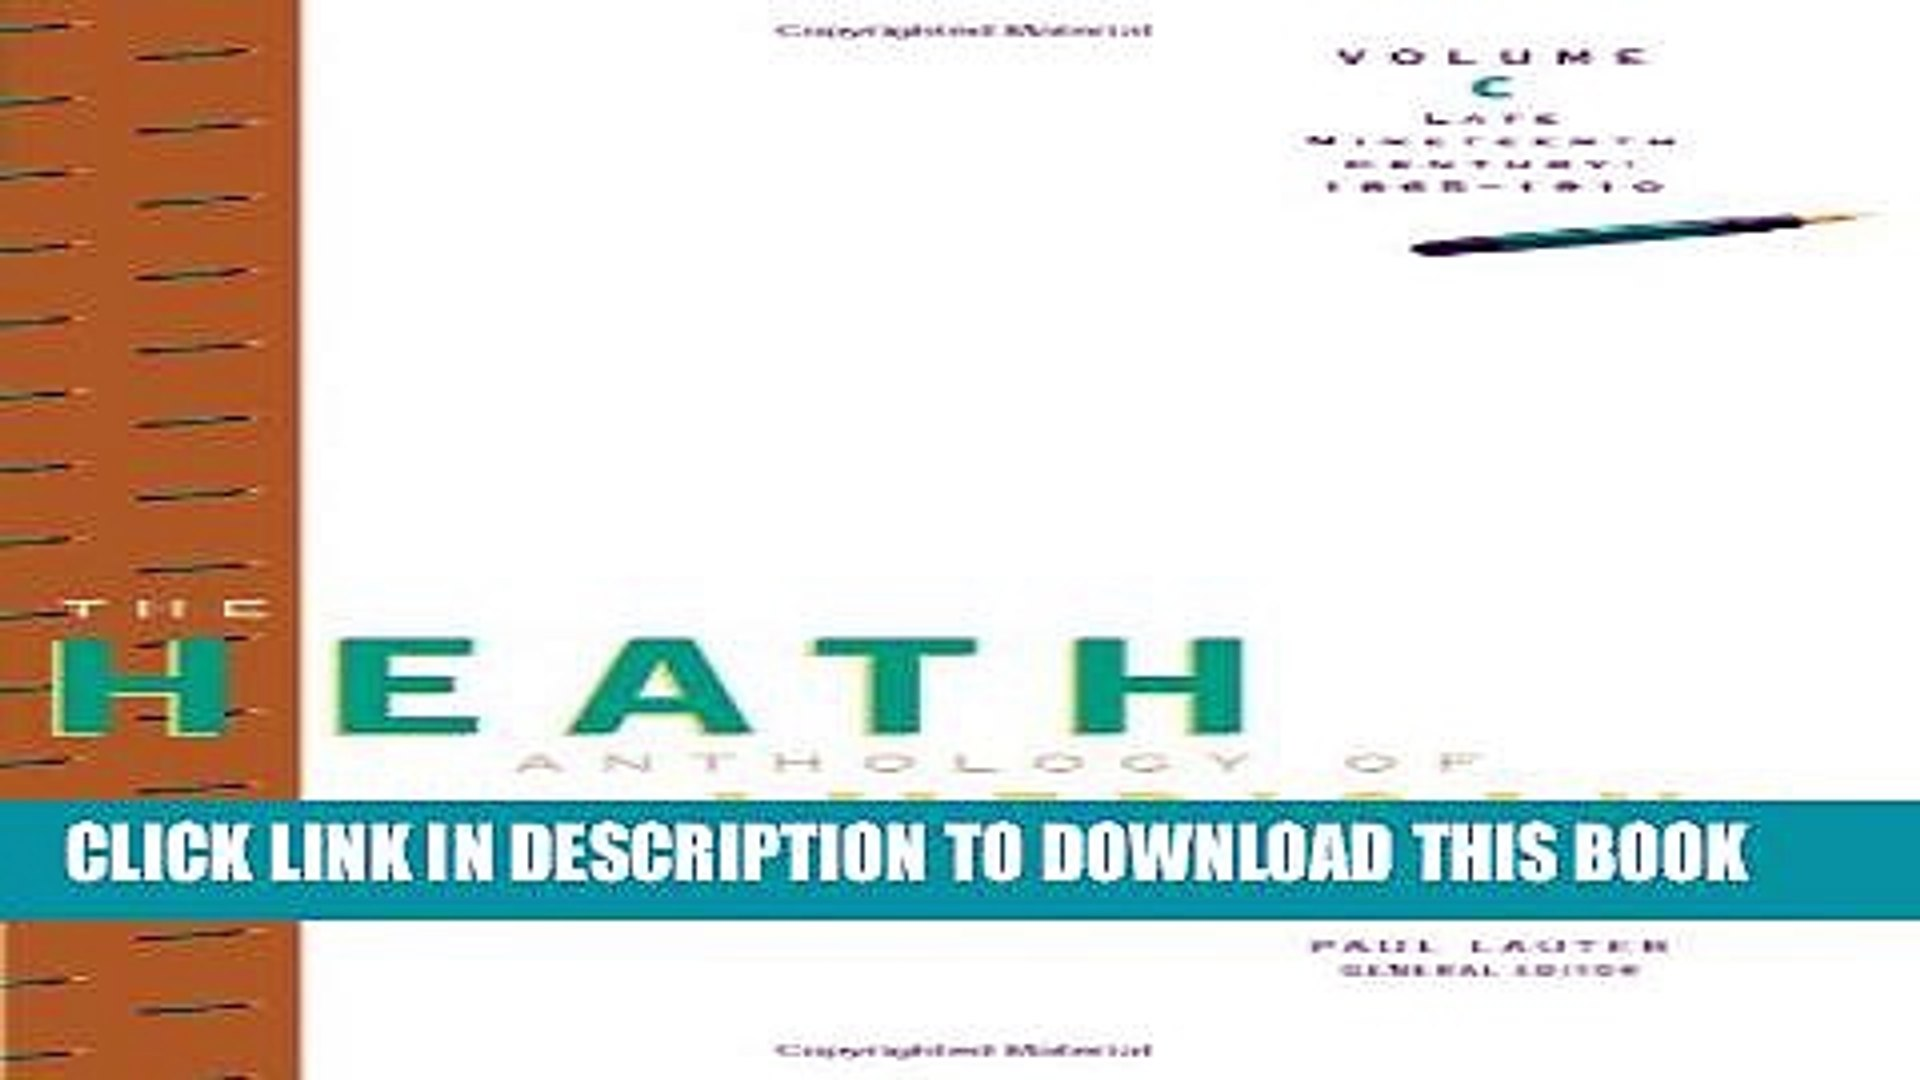 [PDF] The Heath Anthology of American Literature: Late Nineteenth Century (1865-1910), Volume C